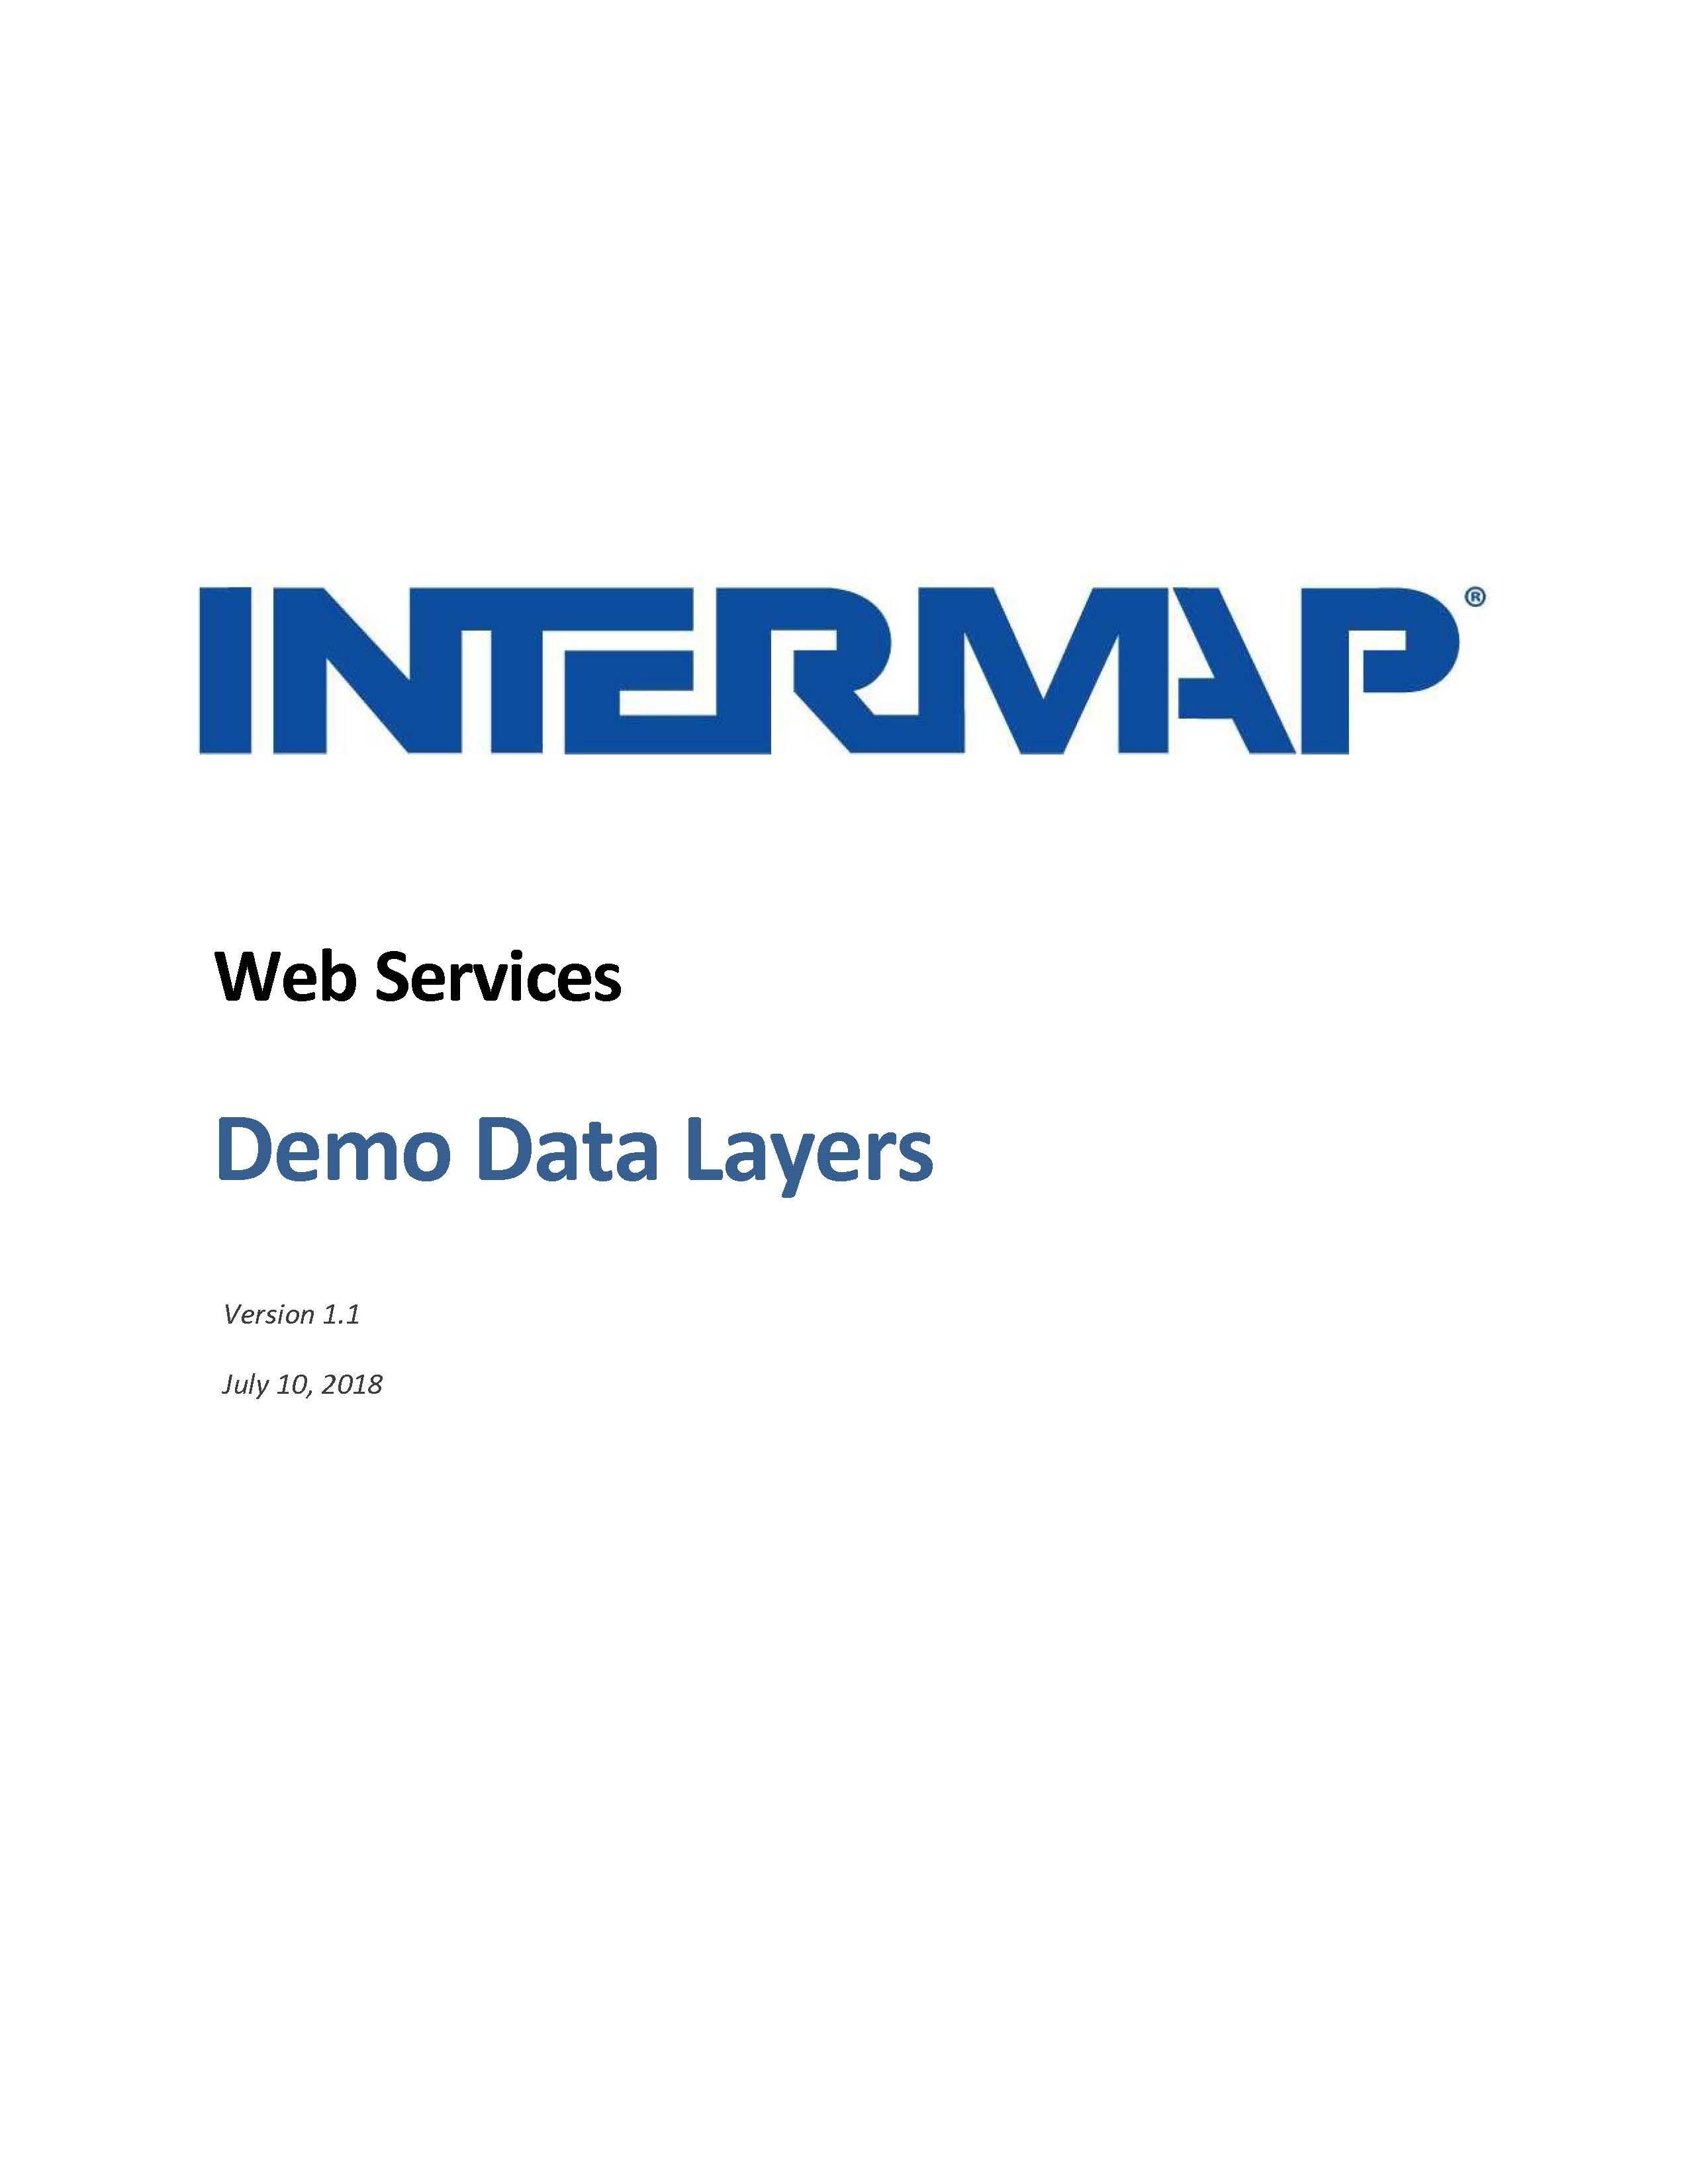 20171104 - Demo Data Layers_Page_1.jpg